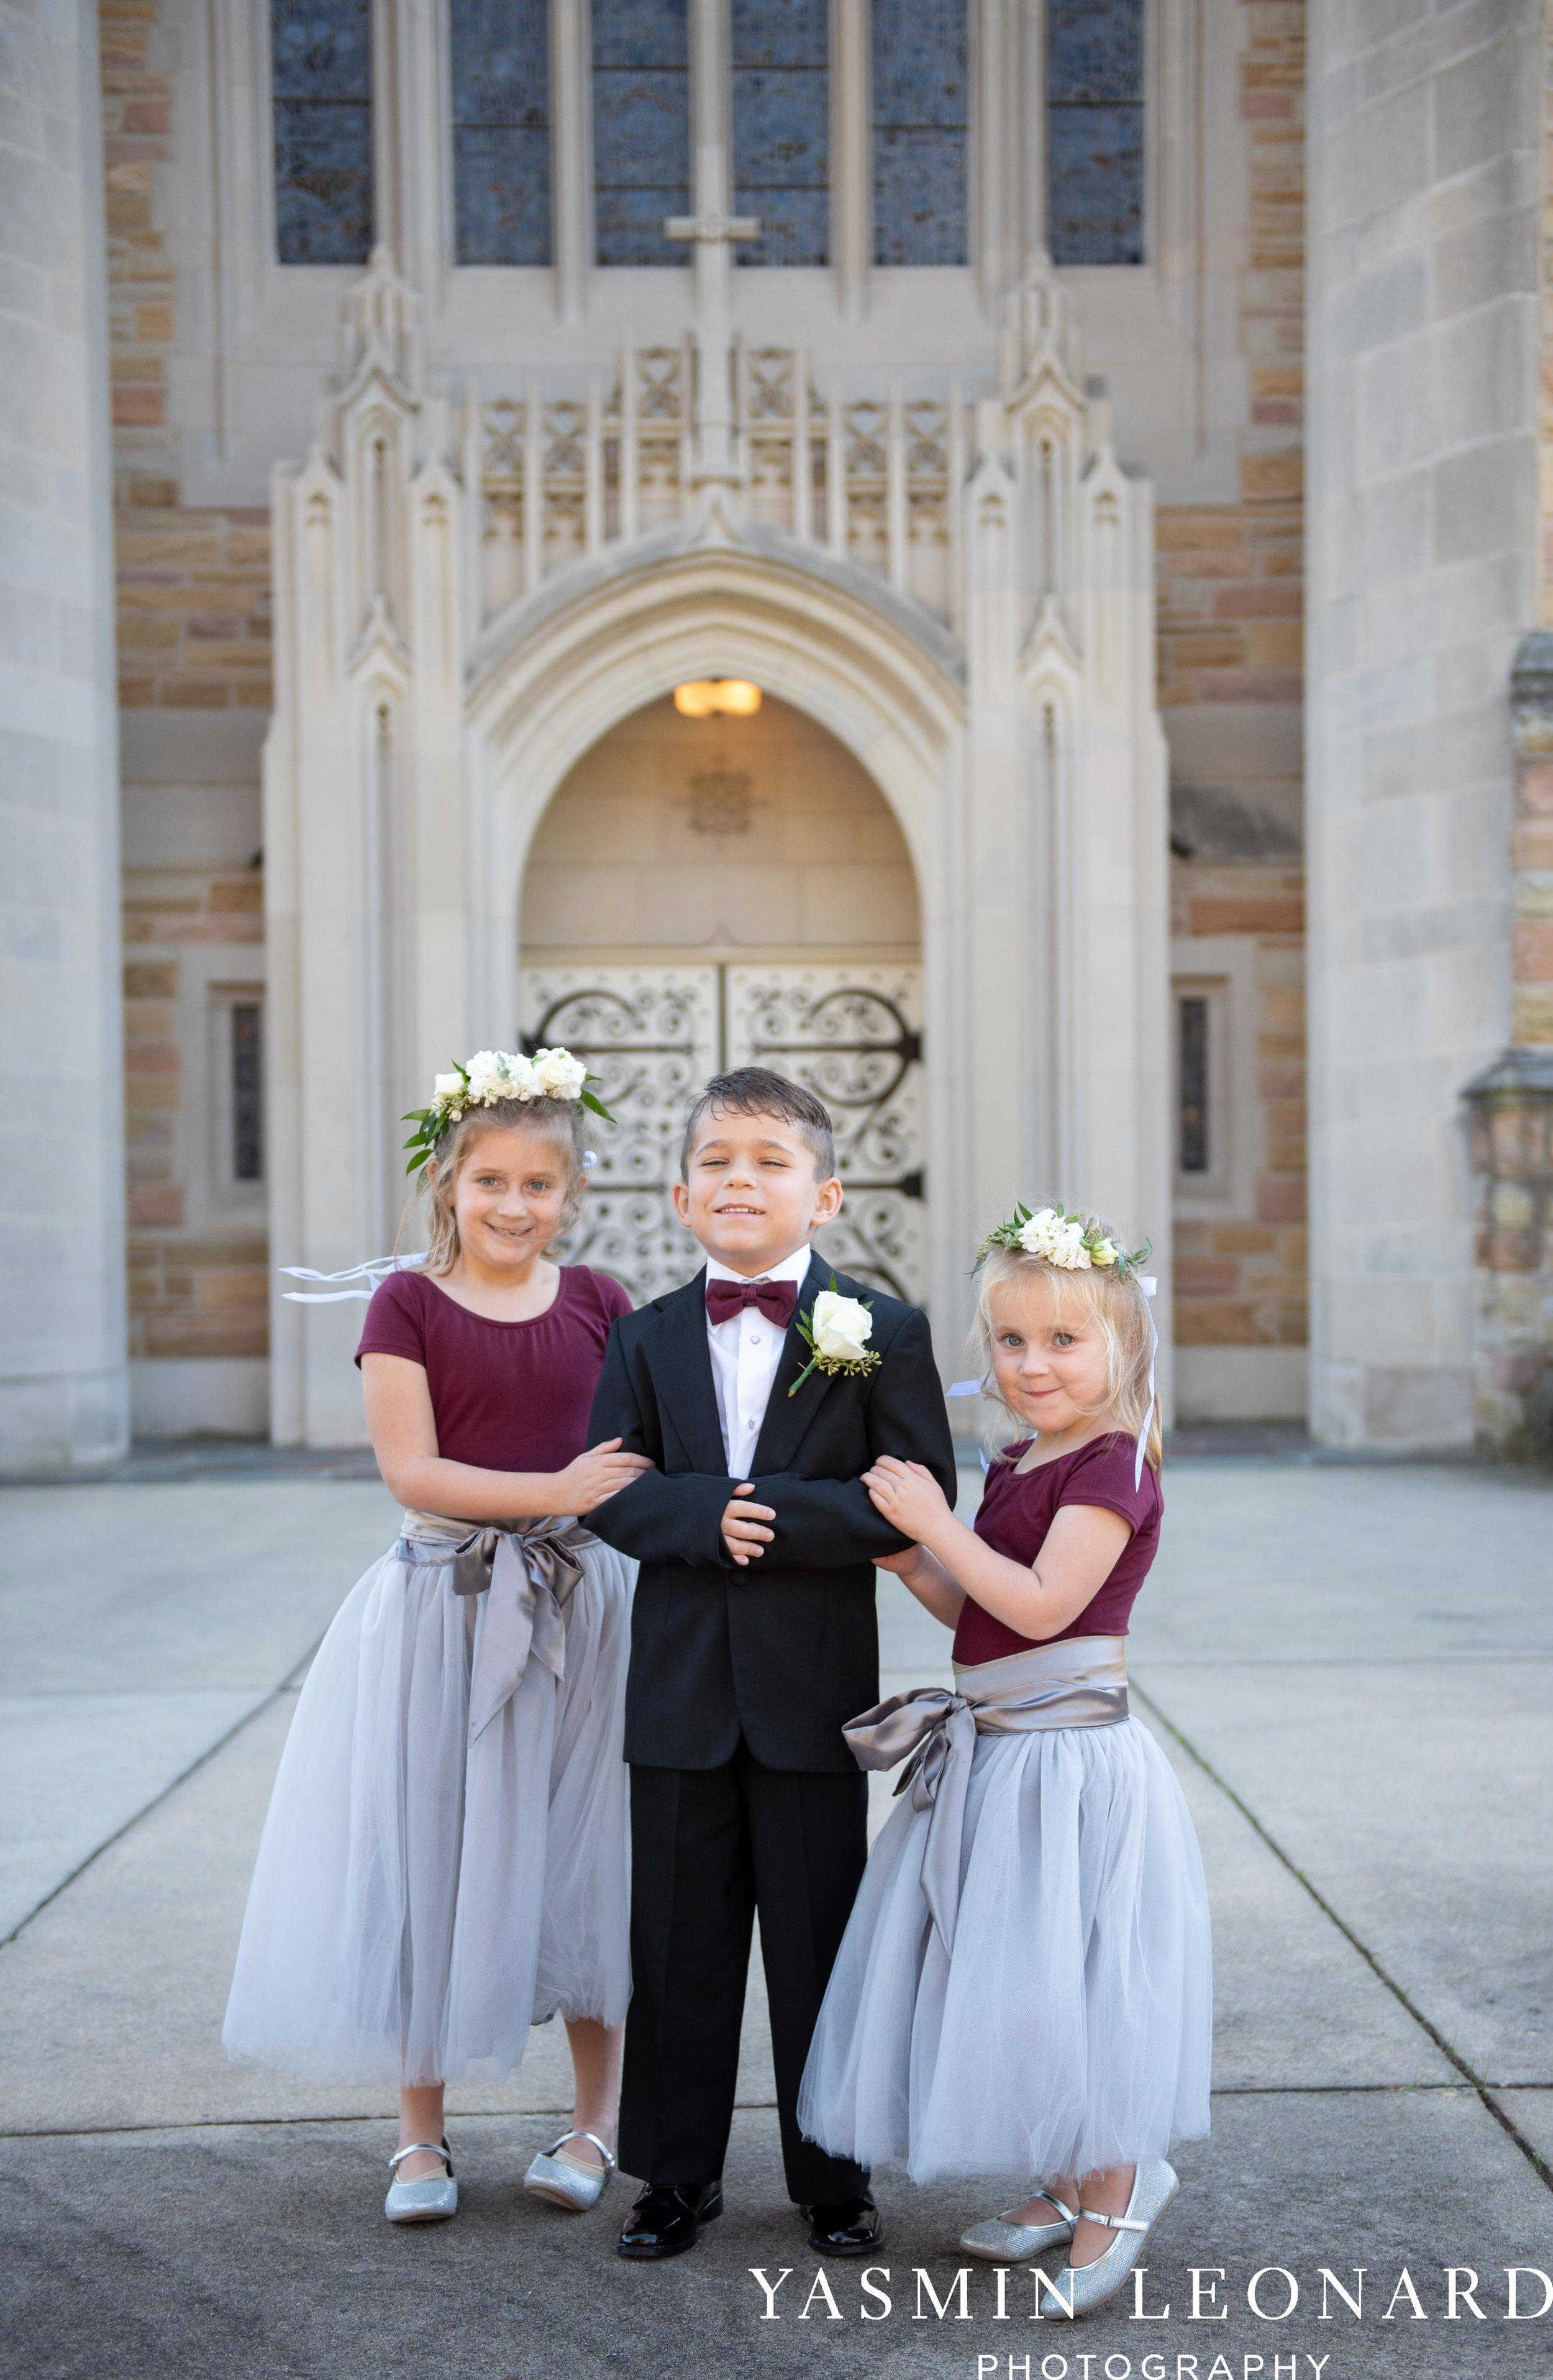 Wesley Memorial United Methodist Church - Old Homeplace Winery - High Point Weddings - High Point Wedding Photographer - NC Weddings - NC Barn Venue - Yasmin Leonard Photography-11.jpg